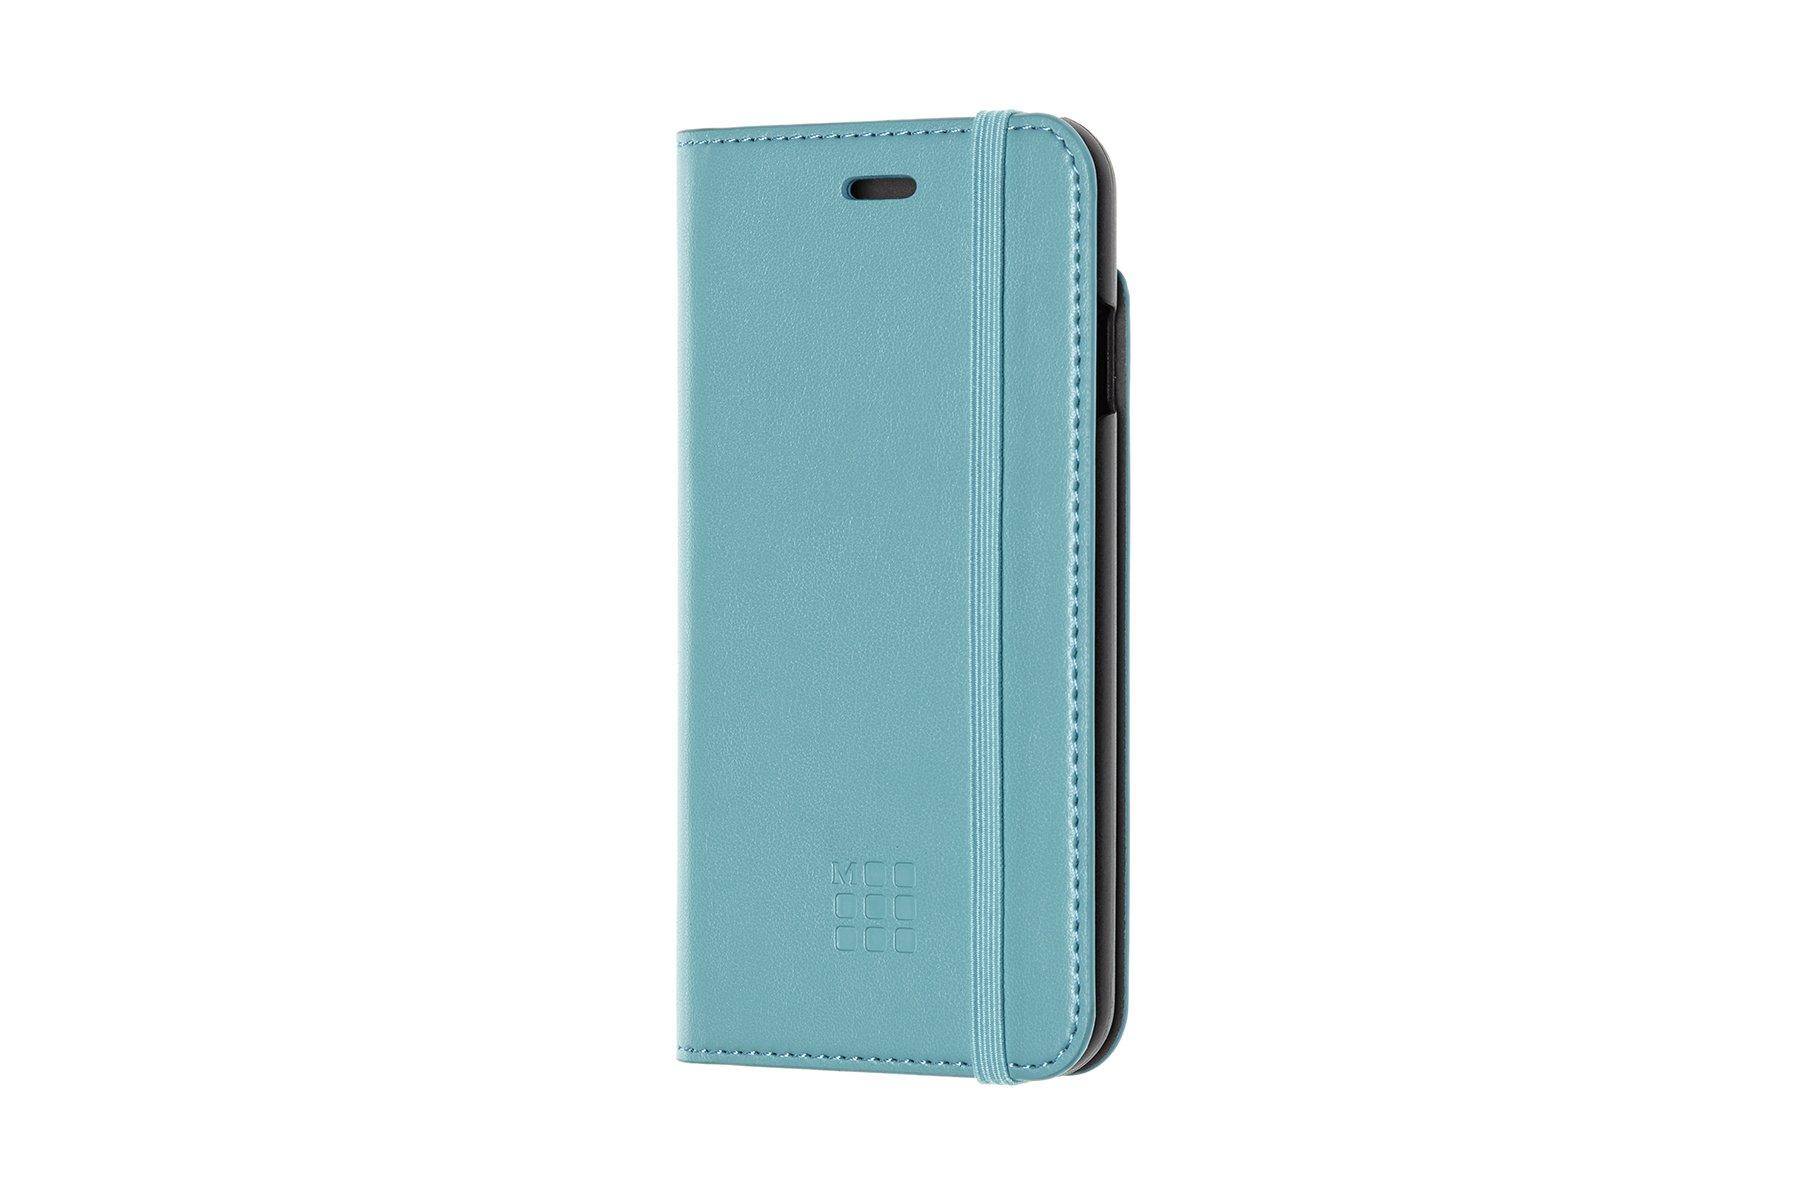 Etui Folio pour Iphone 6/6s/7/8 Bleu Lagon (Englisch) Tageskalender – 30. Juli 2018 Moleskine B079ZSFHB2 ET8CBRP8B35